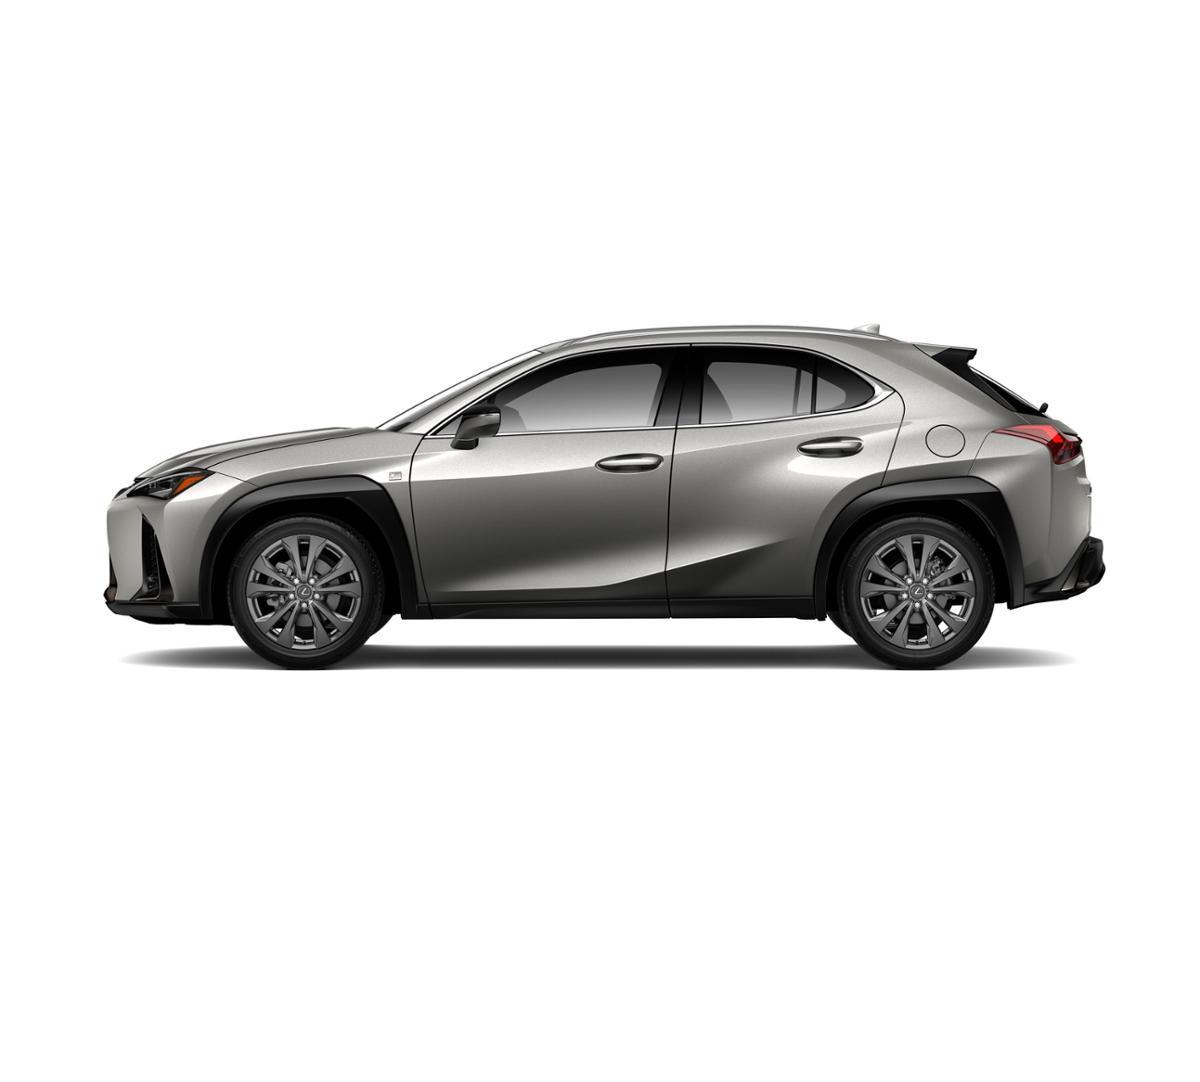 Jim Hudson Lexus Columbia Sc - 2019-2020 New Upcoming Cars by